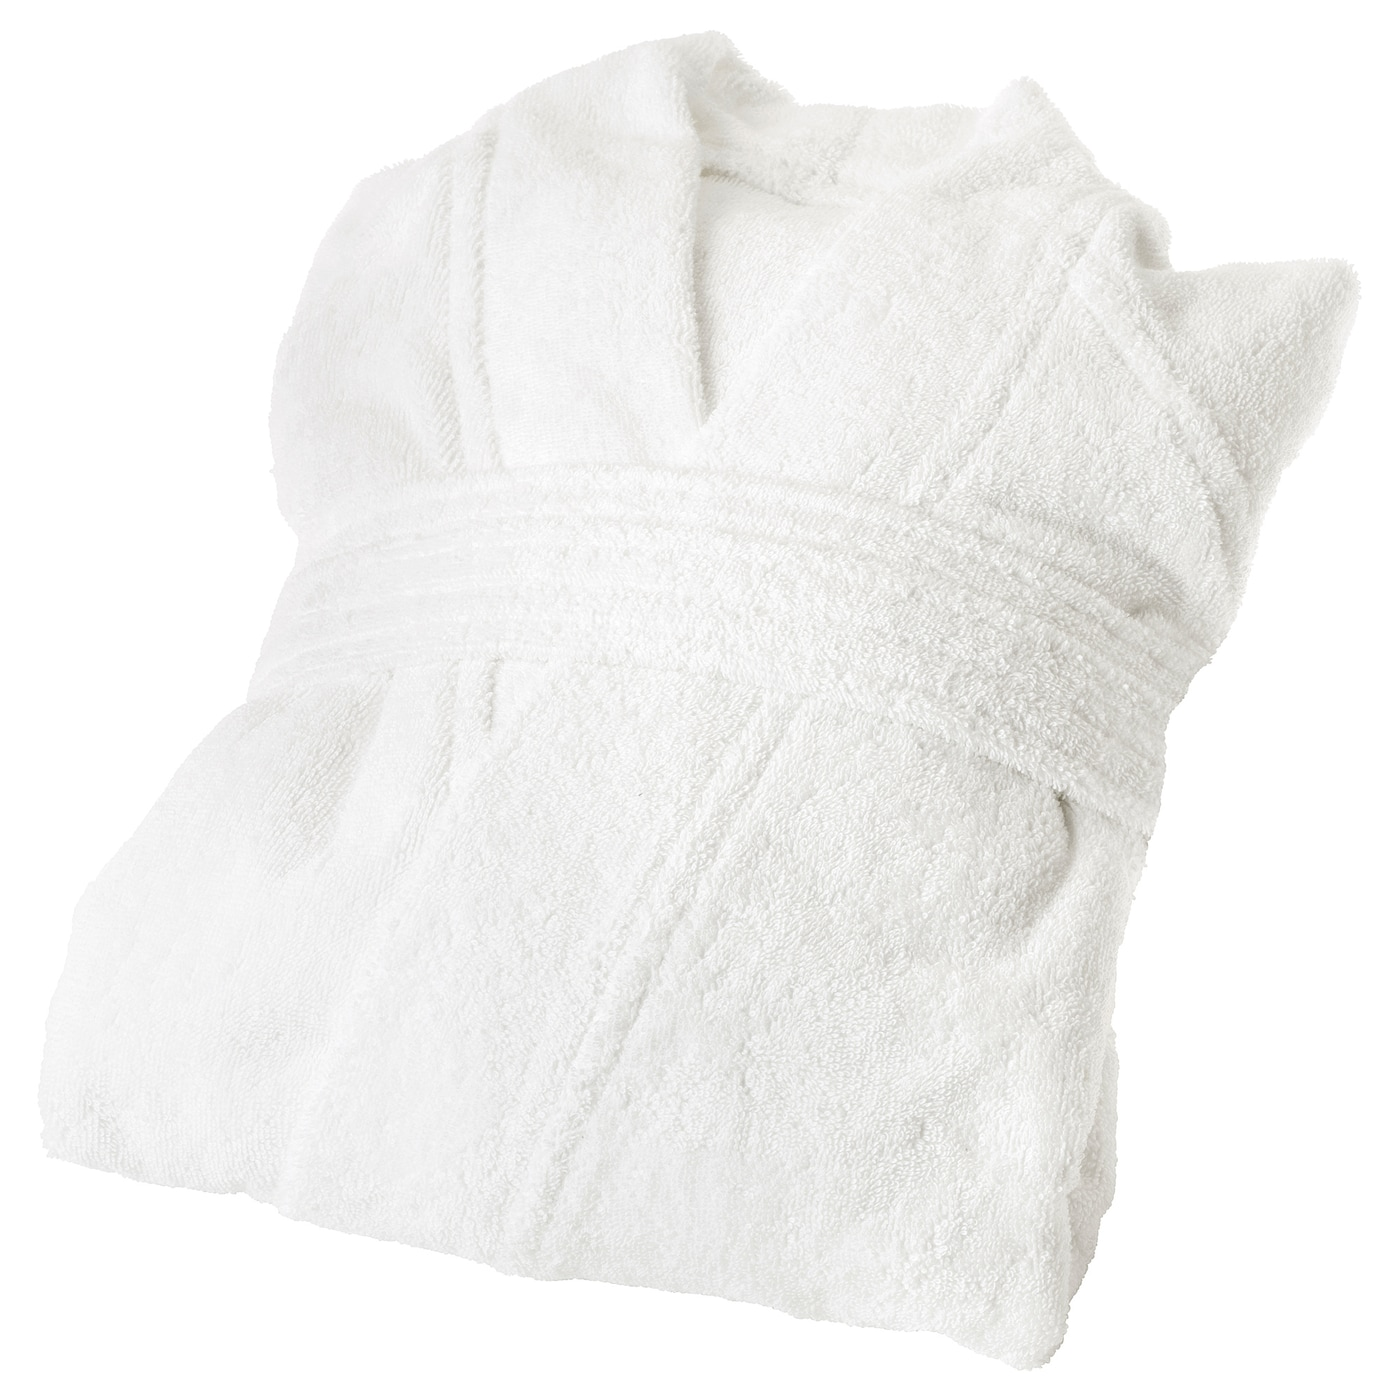 ROCKÅN grey, Bath robe, SM IKEA